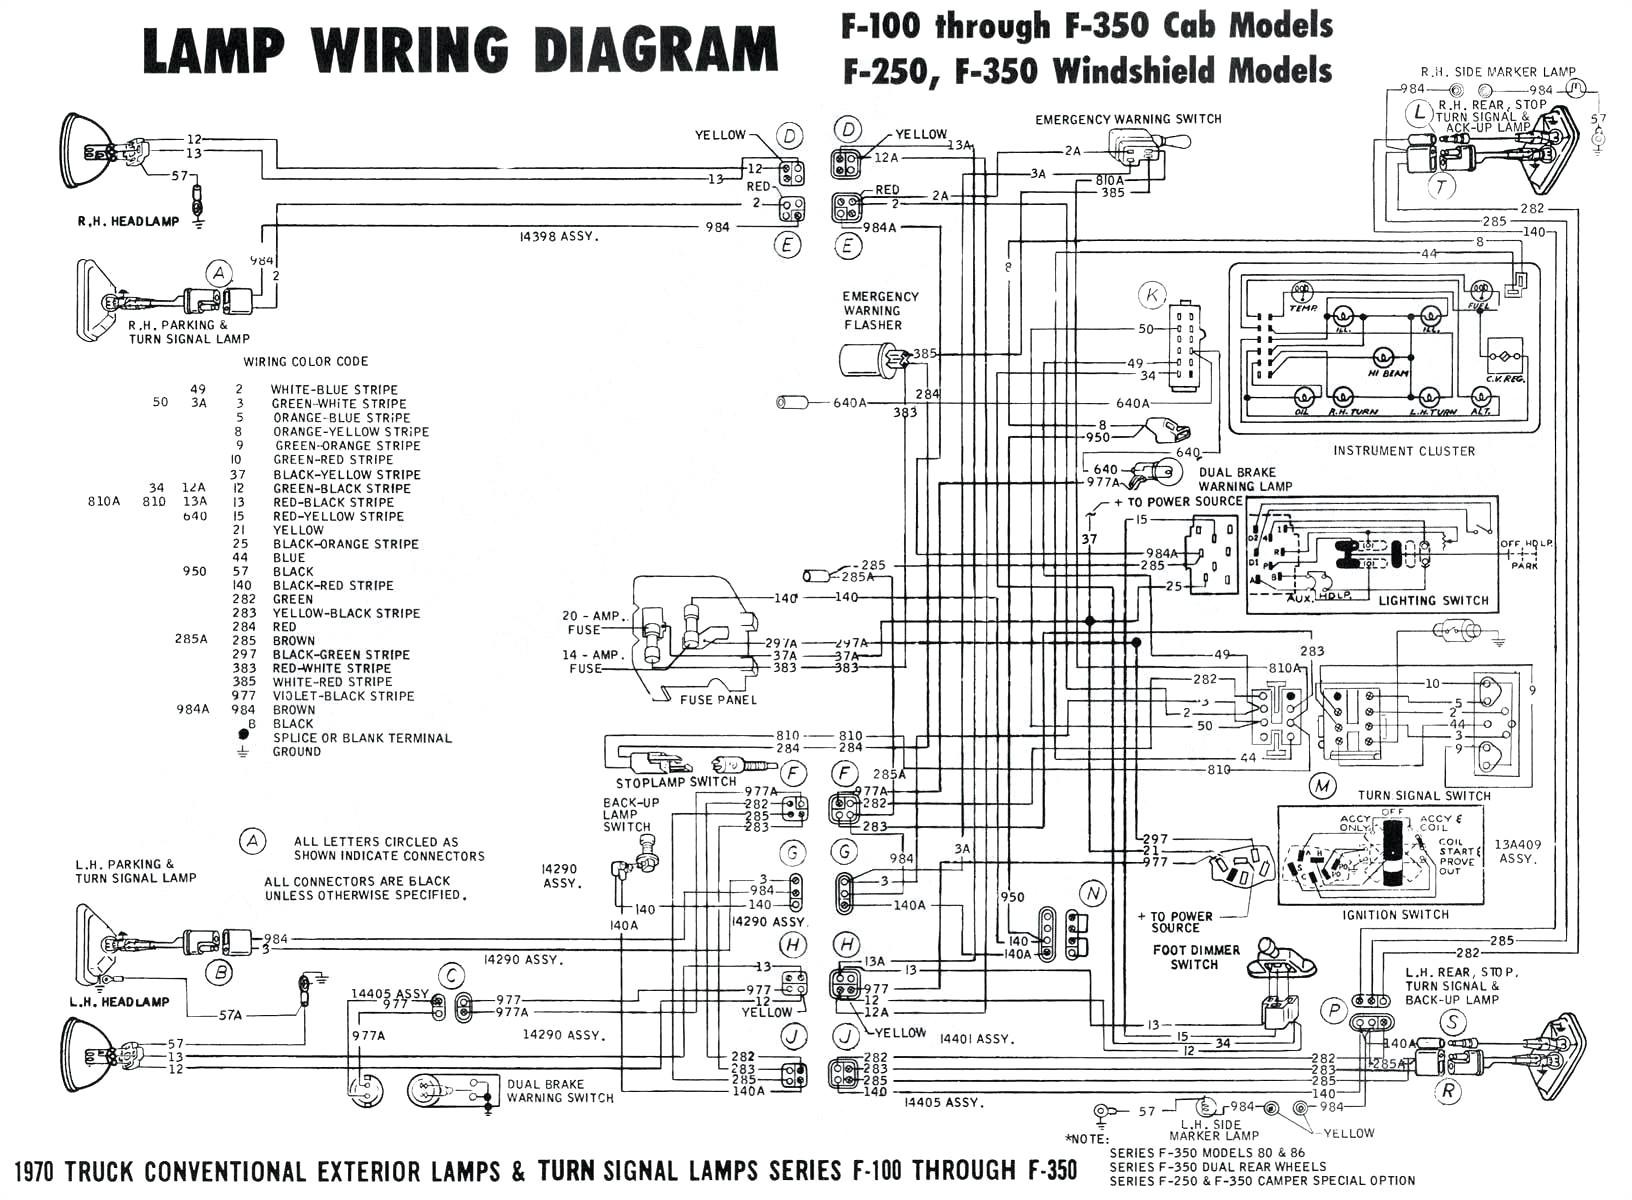 bmw e46 radio harness diagram new best bmw e46 m3 smg wiring diagram of bmw e46 radio harness diagram jpg